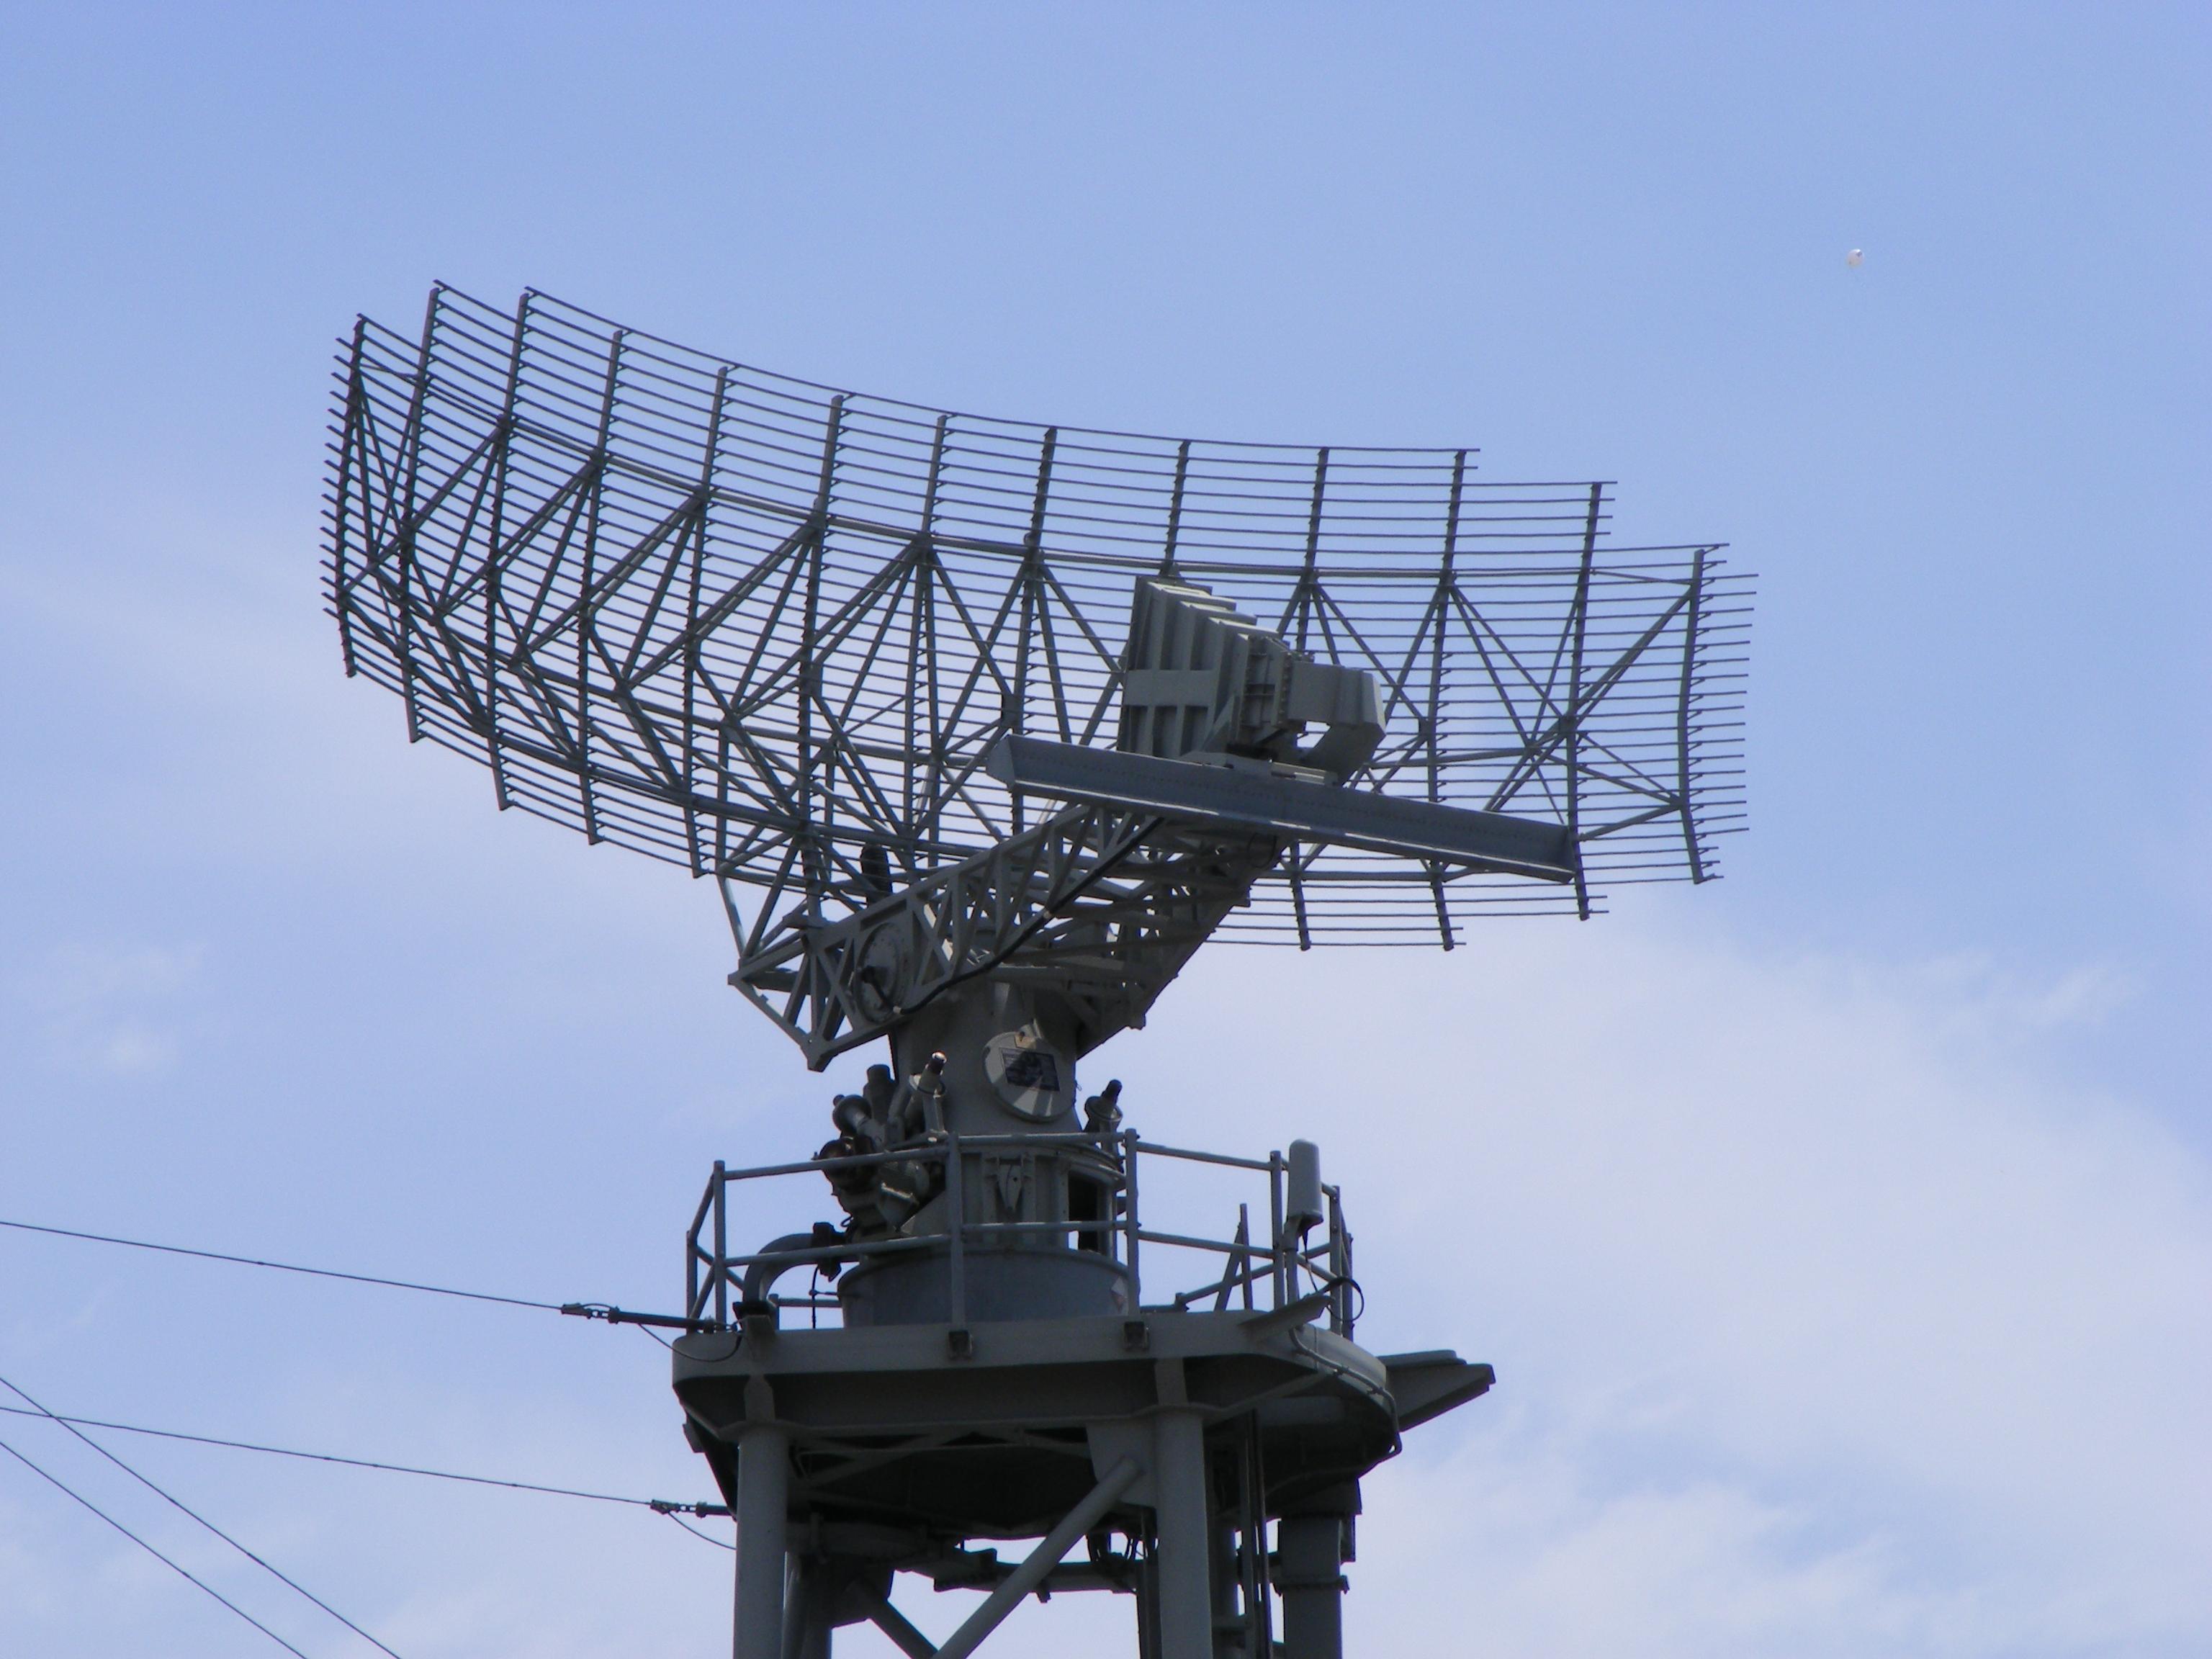 radar - photo #47